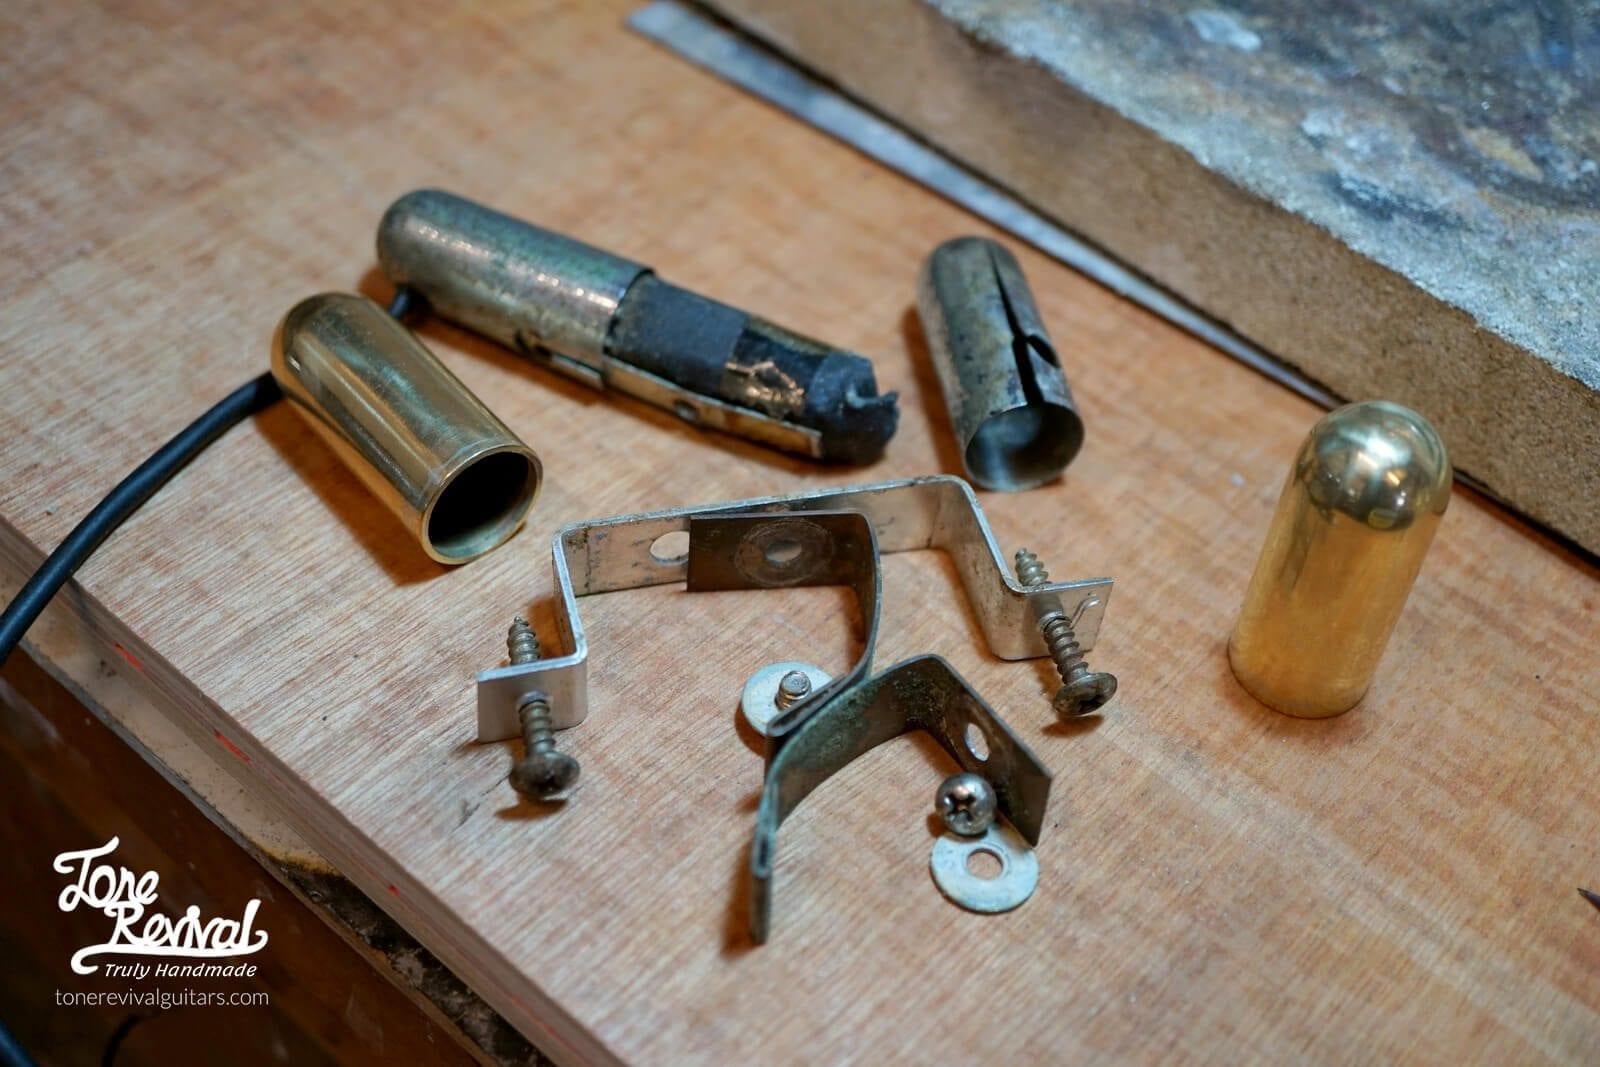 gear look what i found under the pickguard of a junker. Black Bedroom Furniture Sets. Home Design Ideas